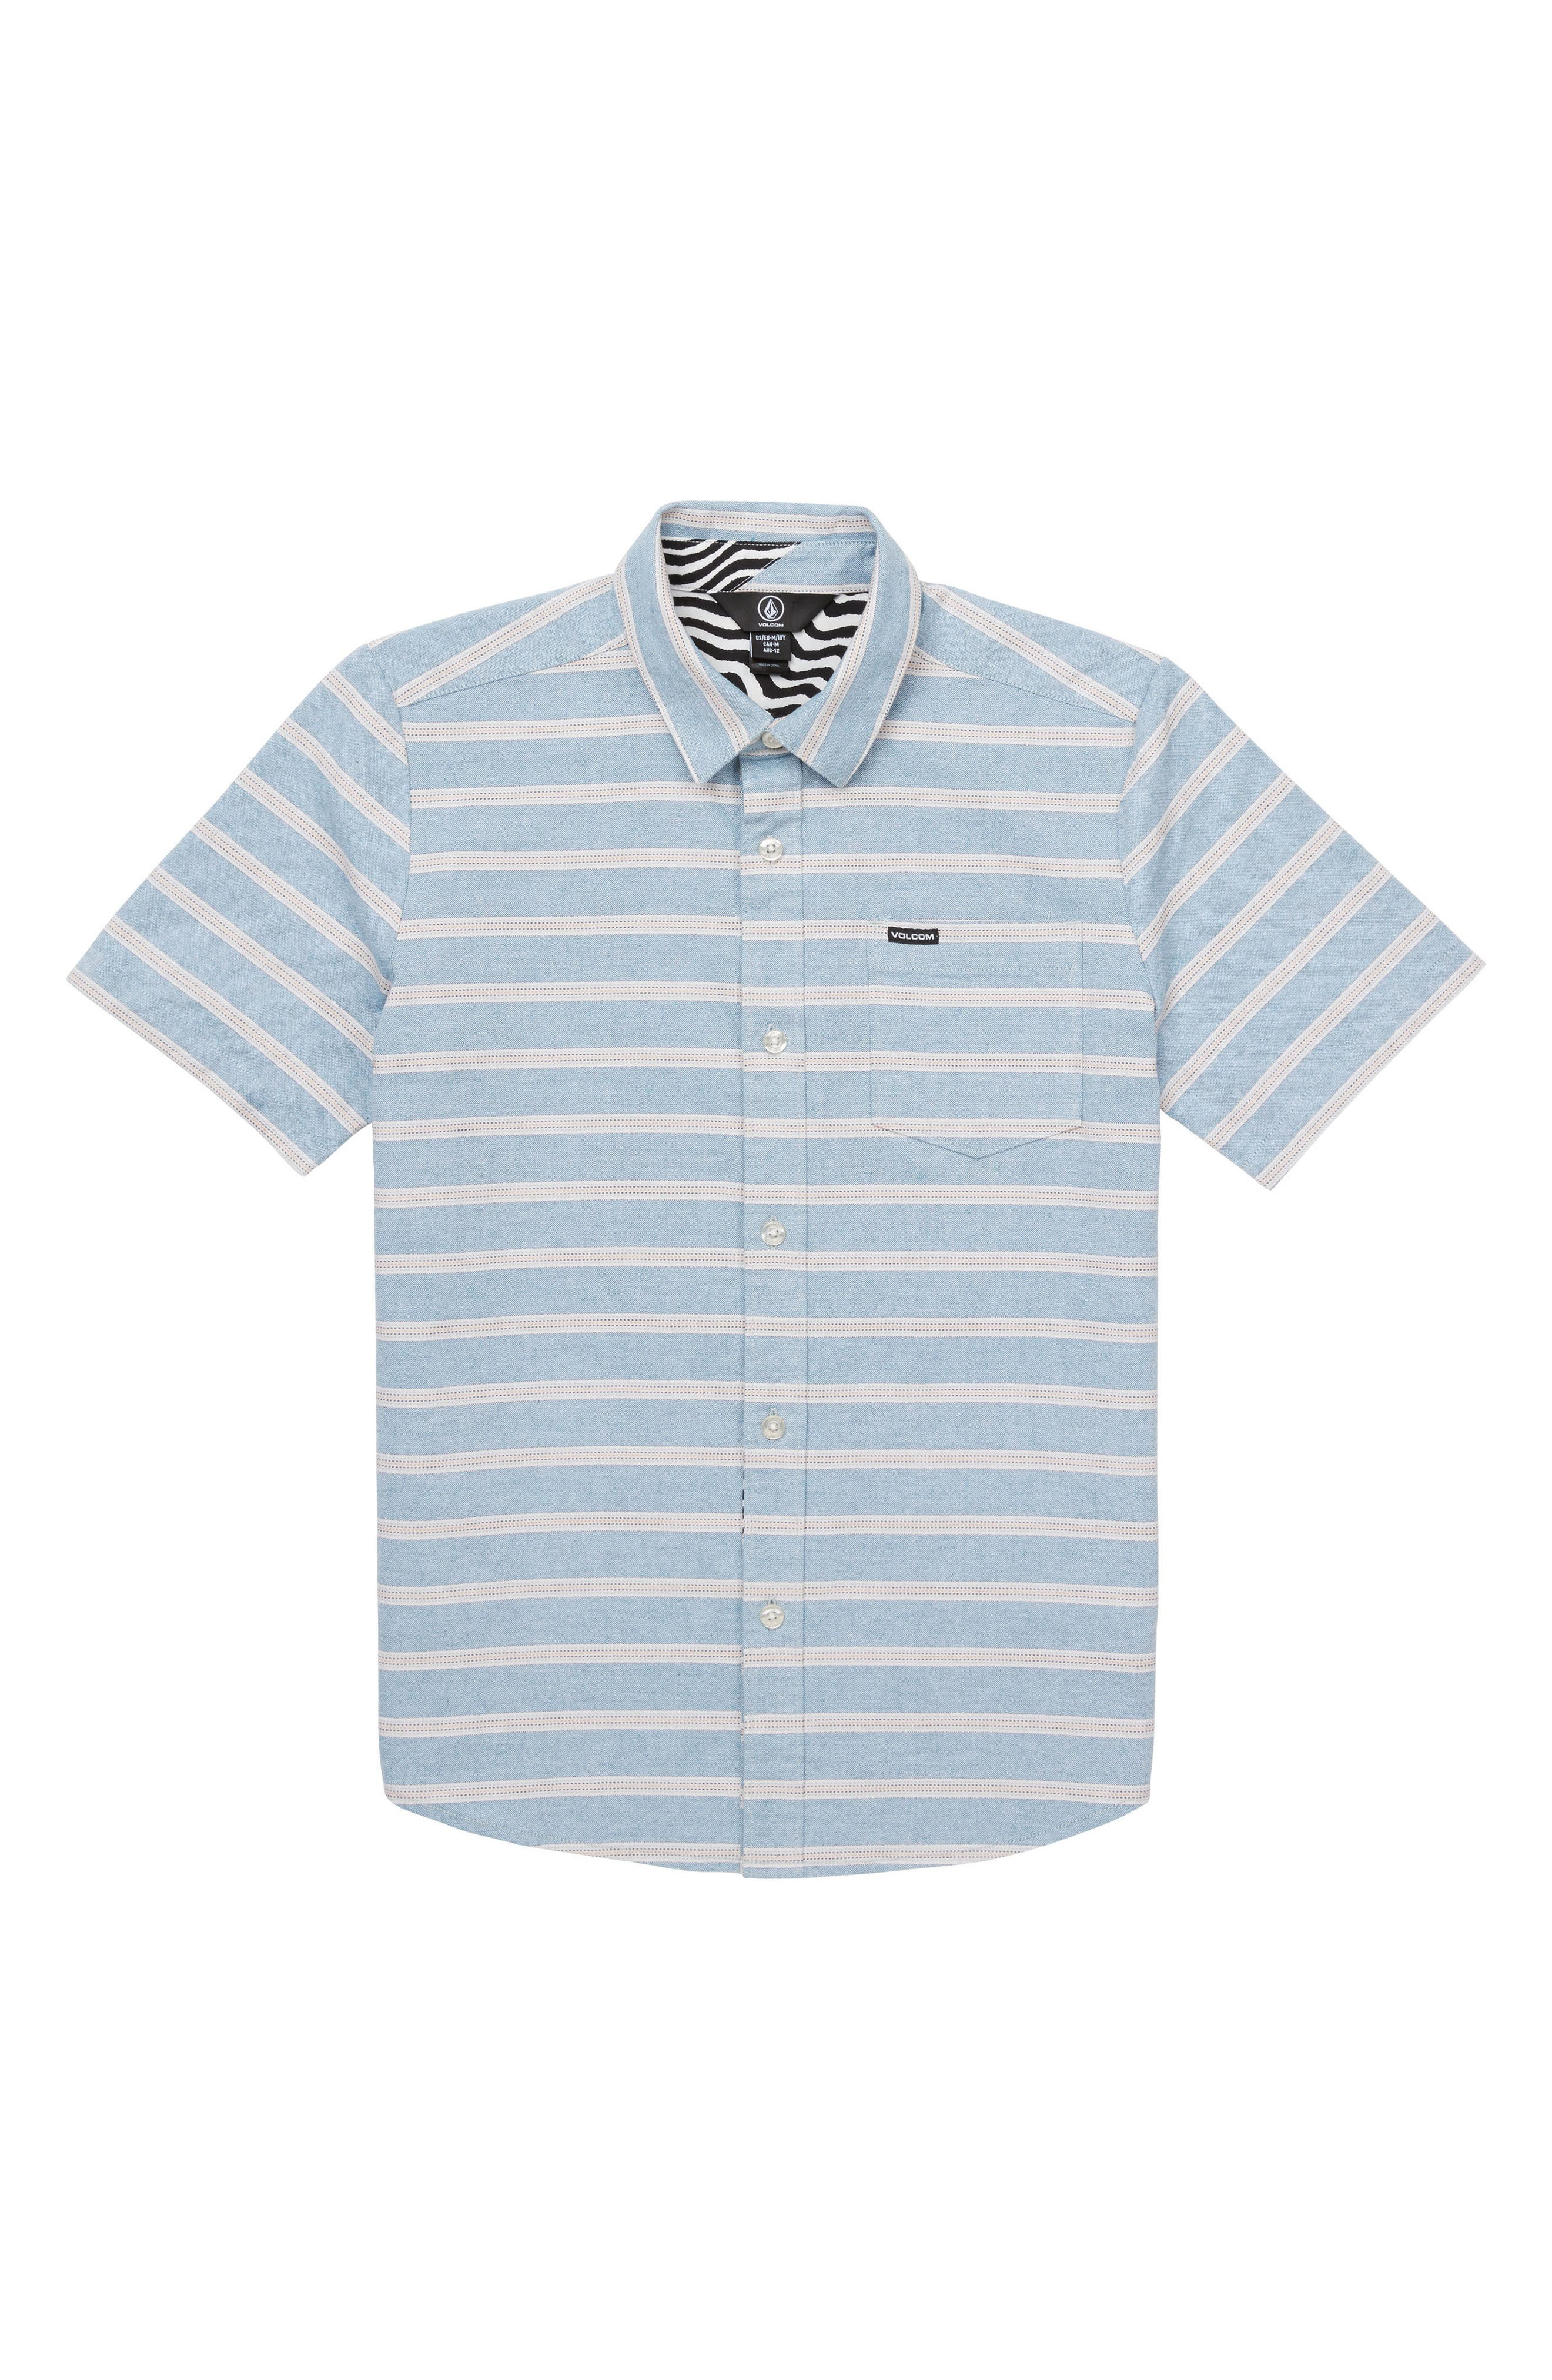 VOLCOM,                             Branson Woven Shirt,                             Main thumbnail 1, color,                             439